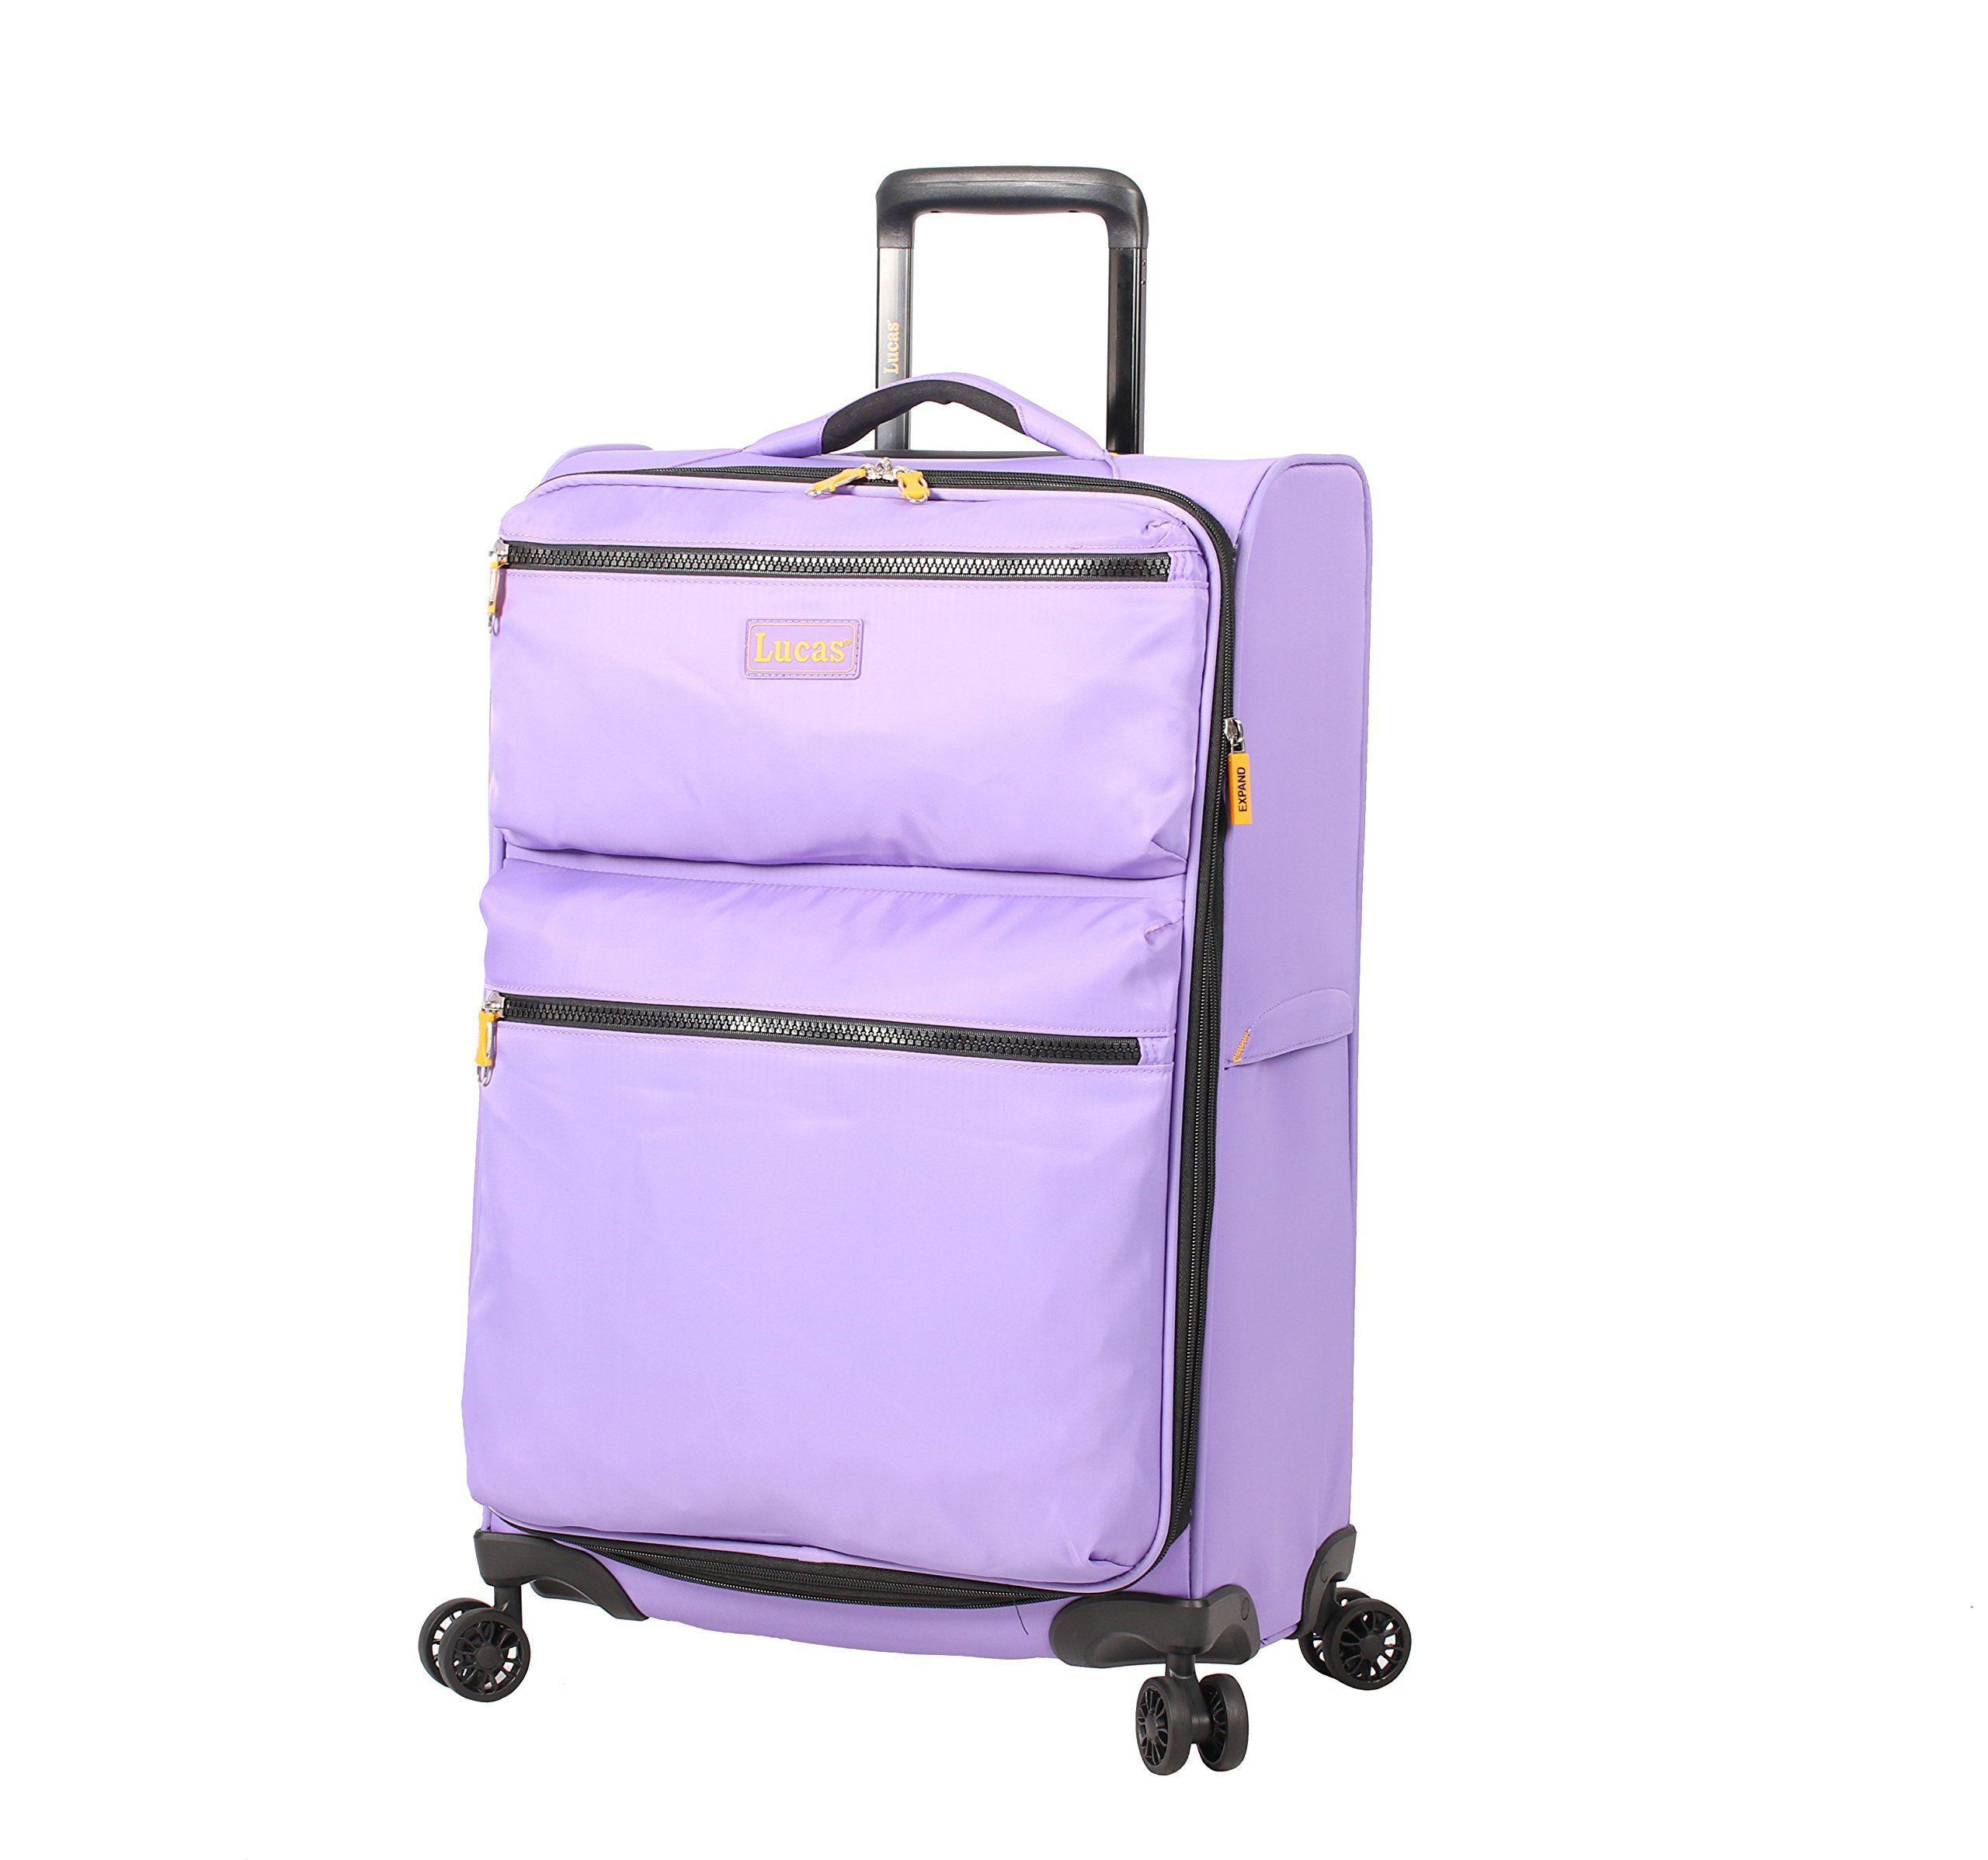 Lucas Ultra Lightweight Large Softside 28 inch Expandable Luggage ...